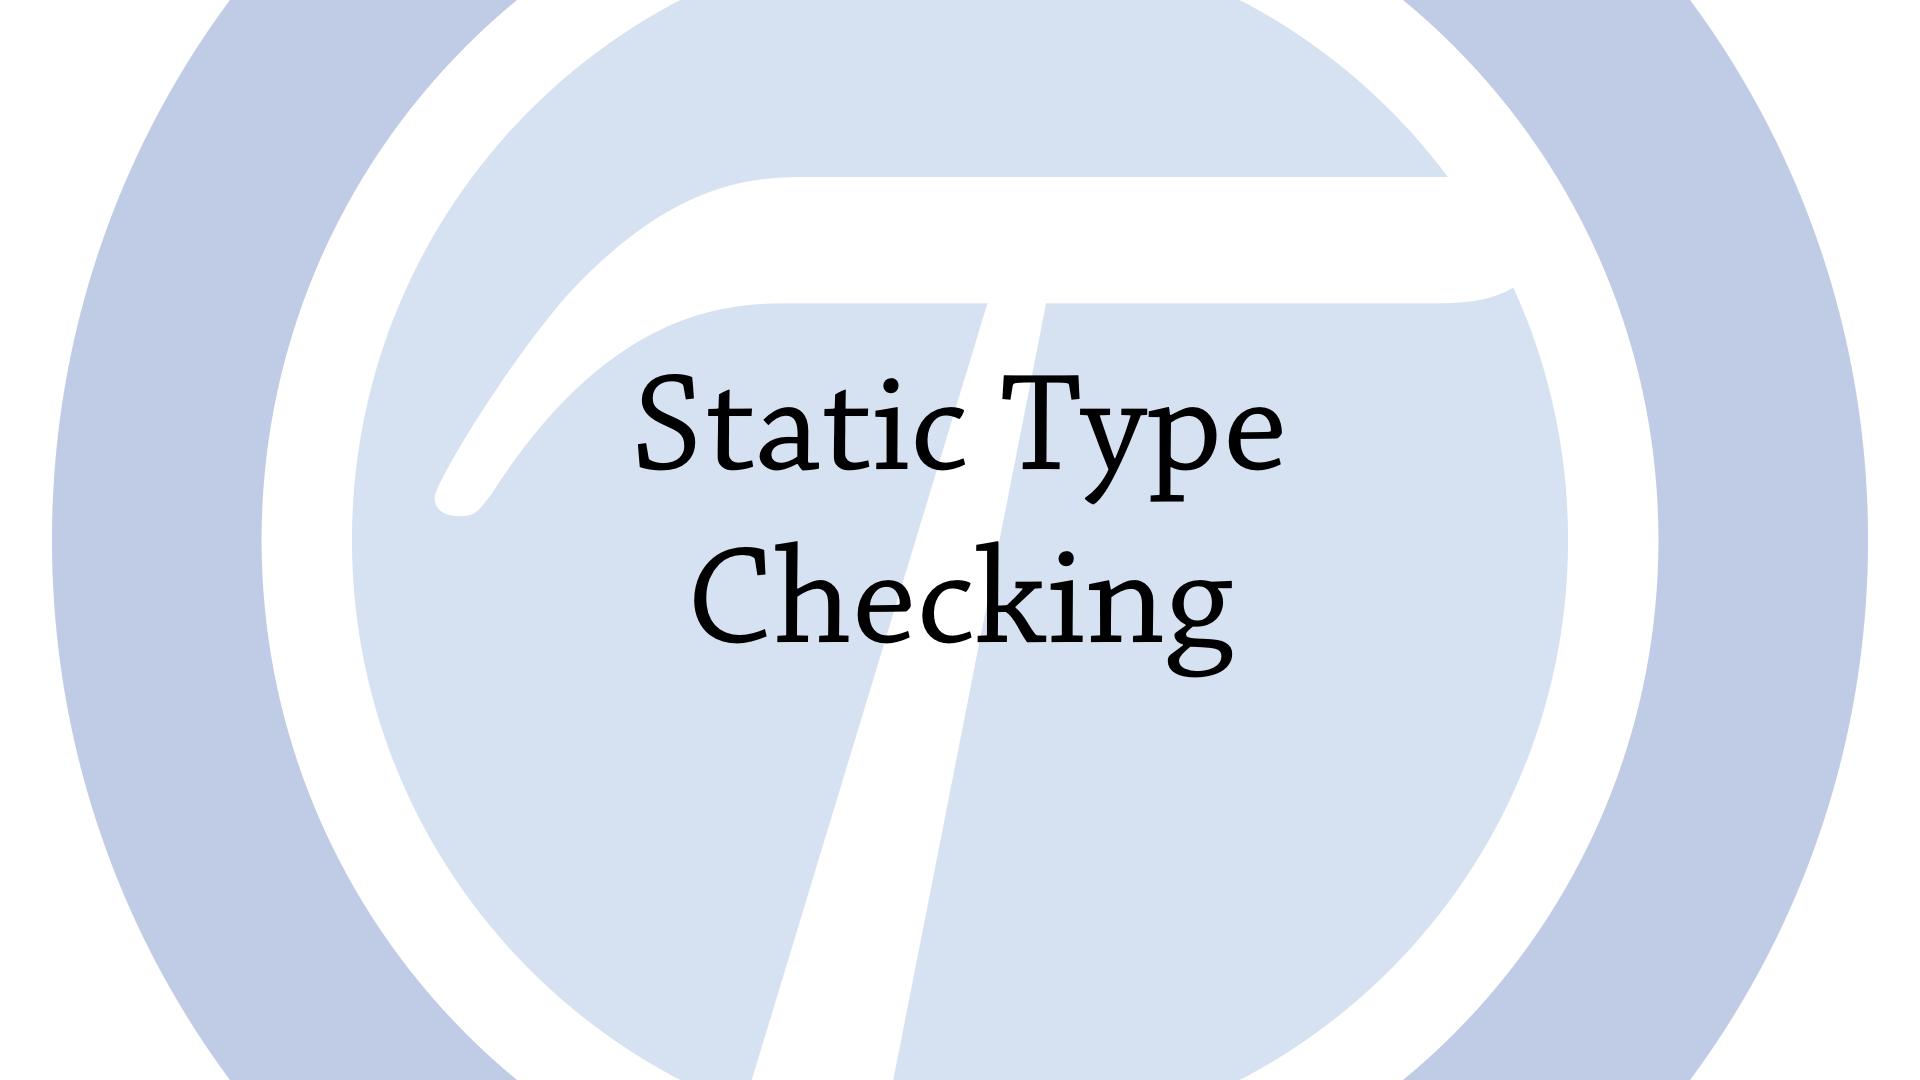 Static type checking